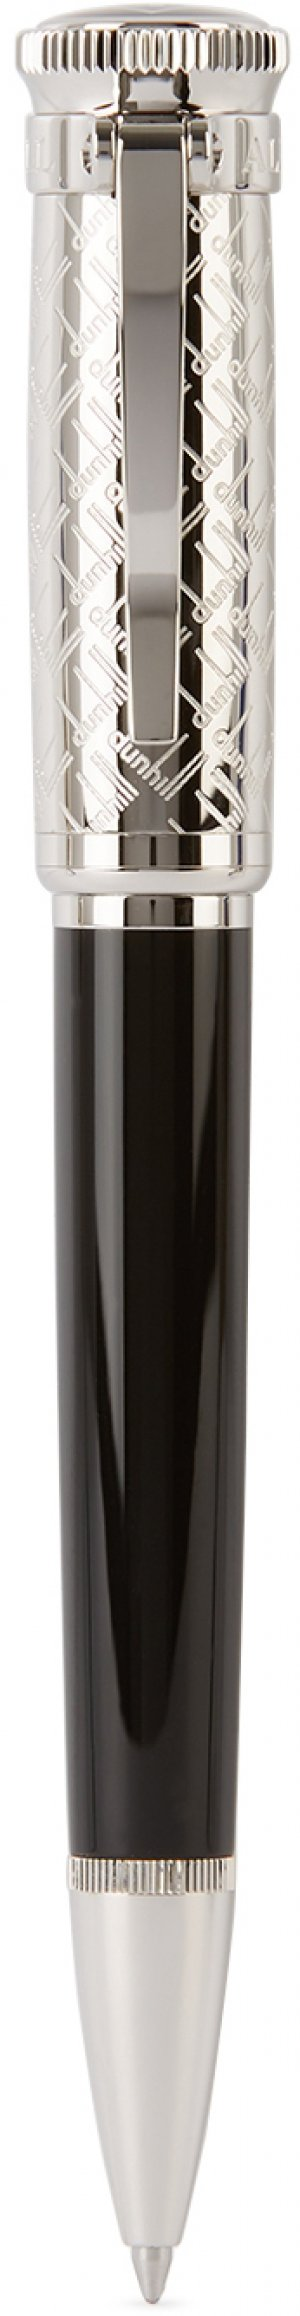 Silver & Black Sentryman Signature Ballpoint Pen Dunhill. Цвет: 1 black